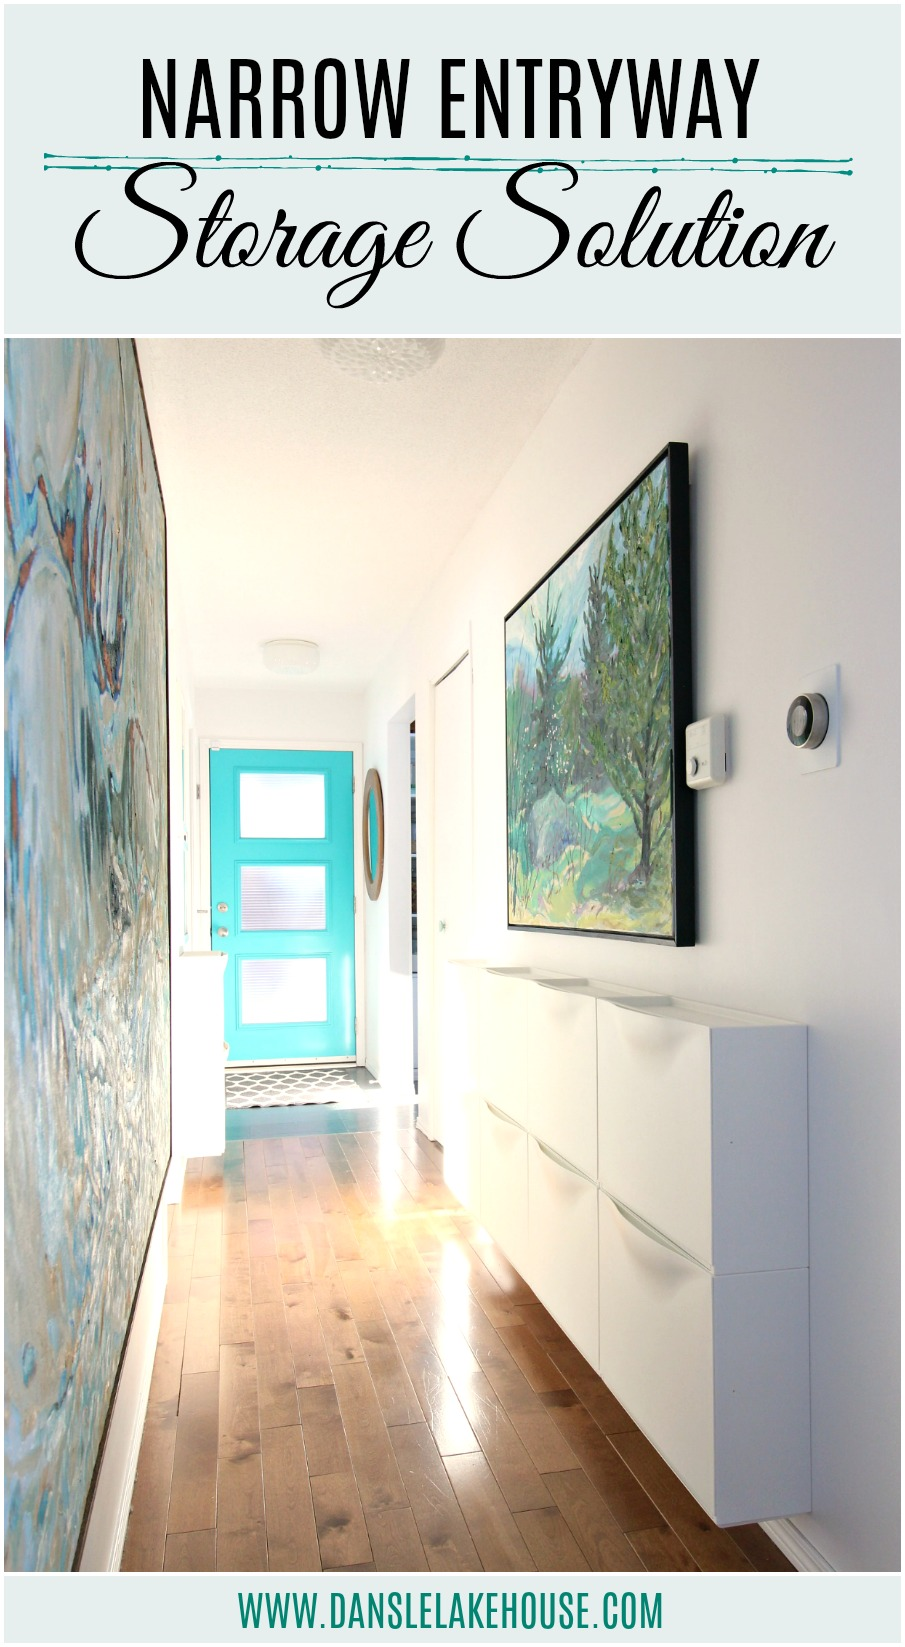 narrow entryway storage solution